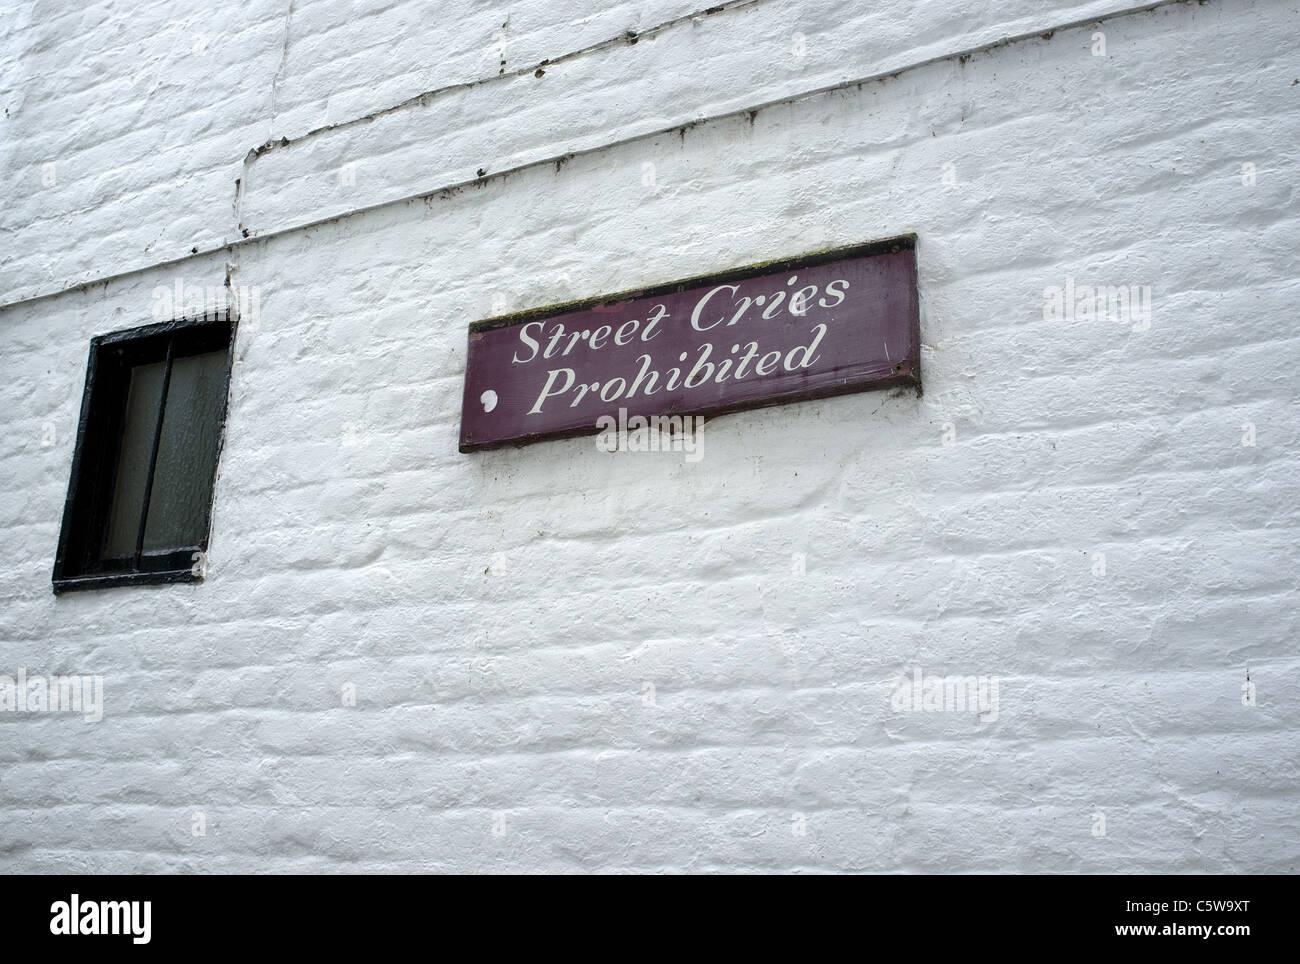 Street Cries Prohibited Sign on Wall of The White Swan Pub, Twickenham, London Borough of Richmond, UK - Stock Image